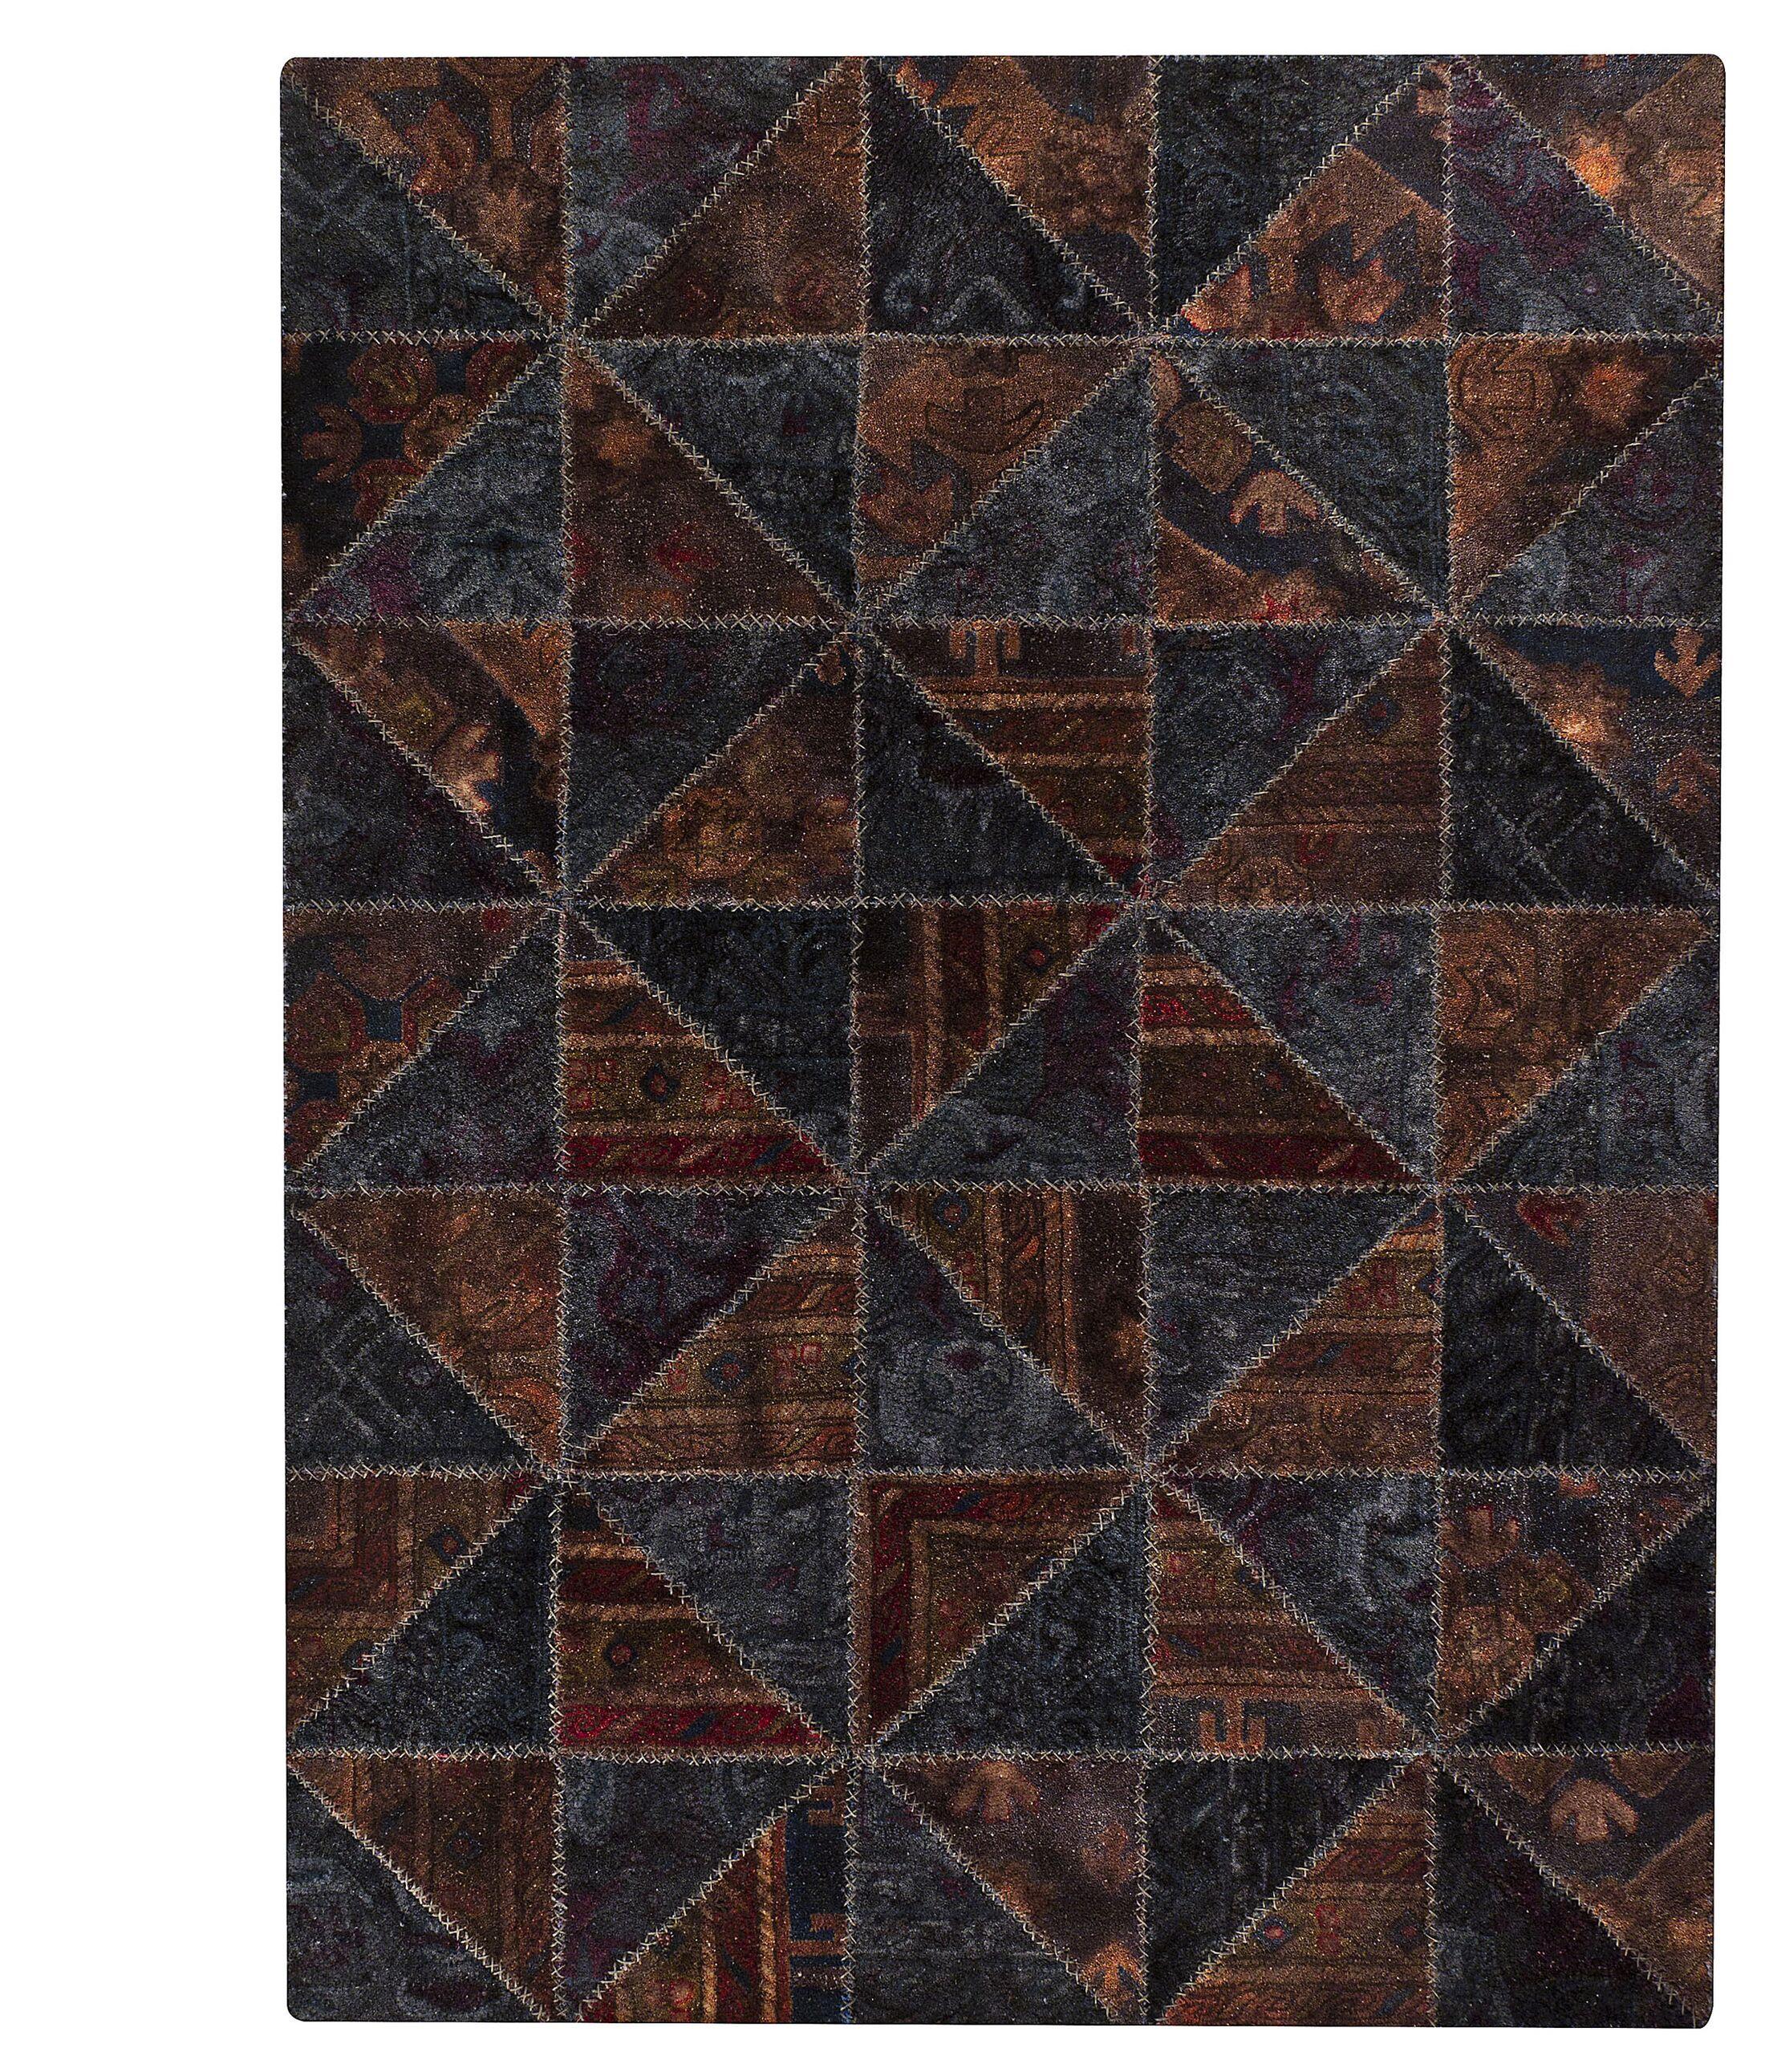 Tile Viviana Black / Brown Area Rug Rug Size: 5'2